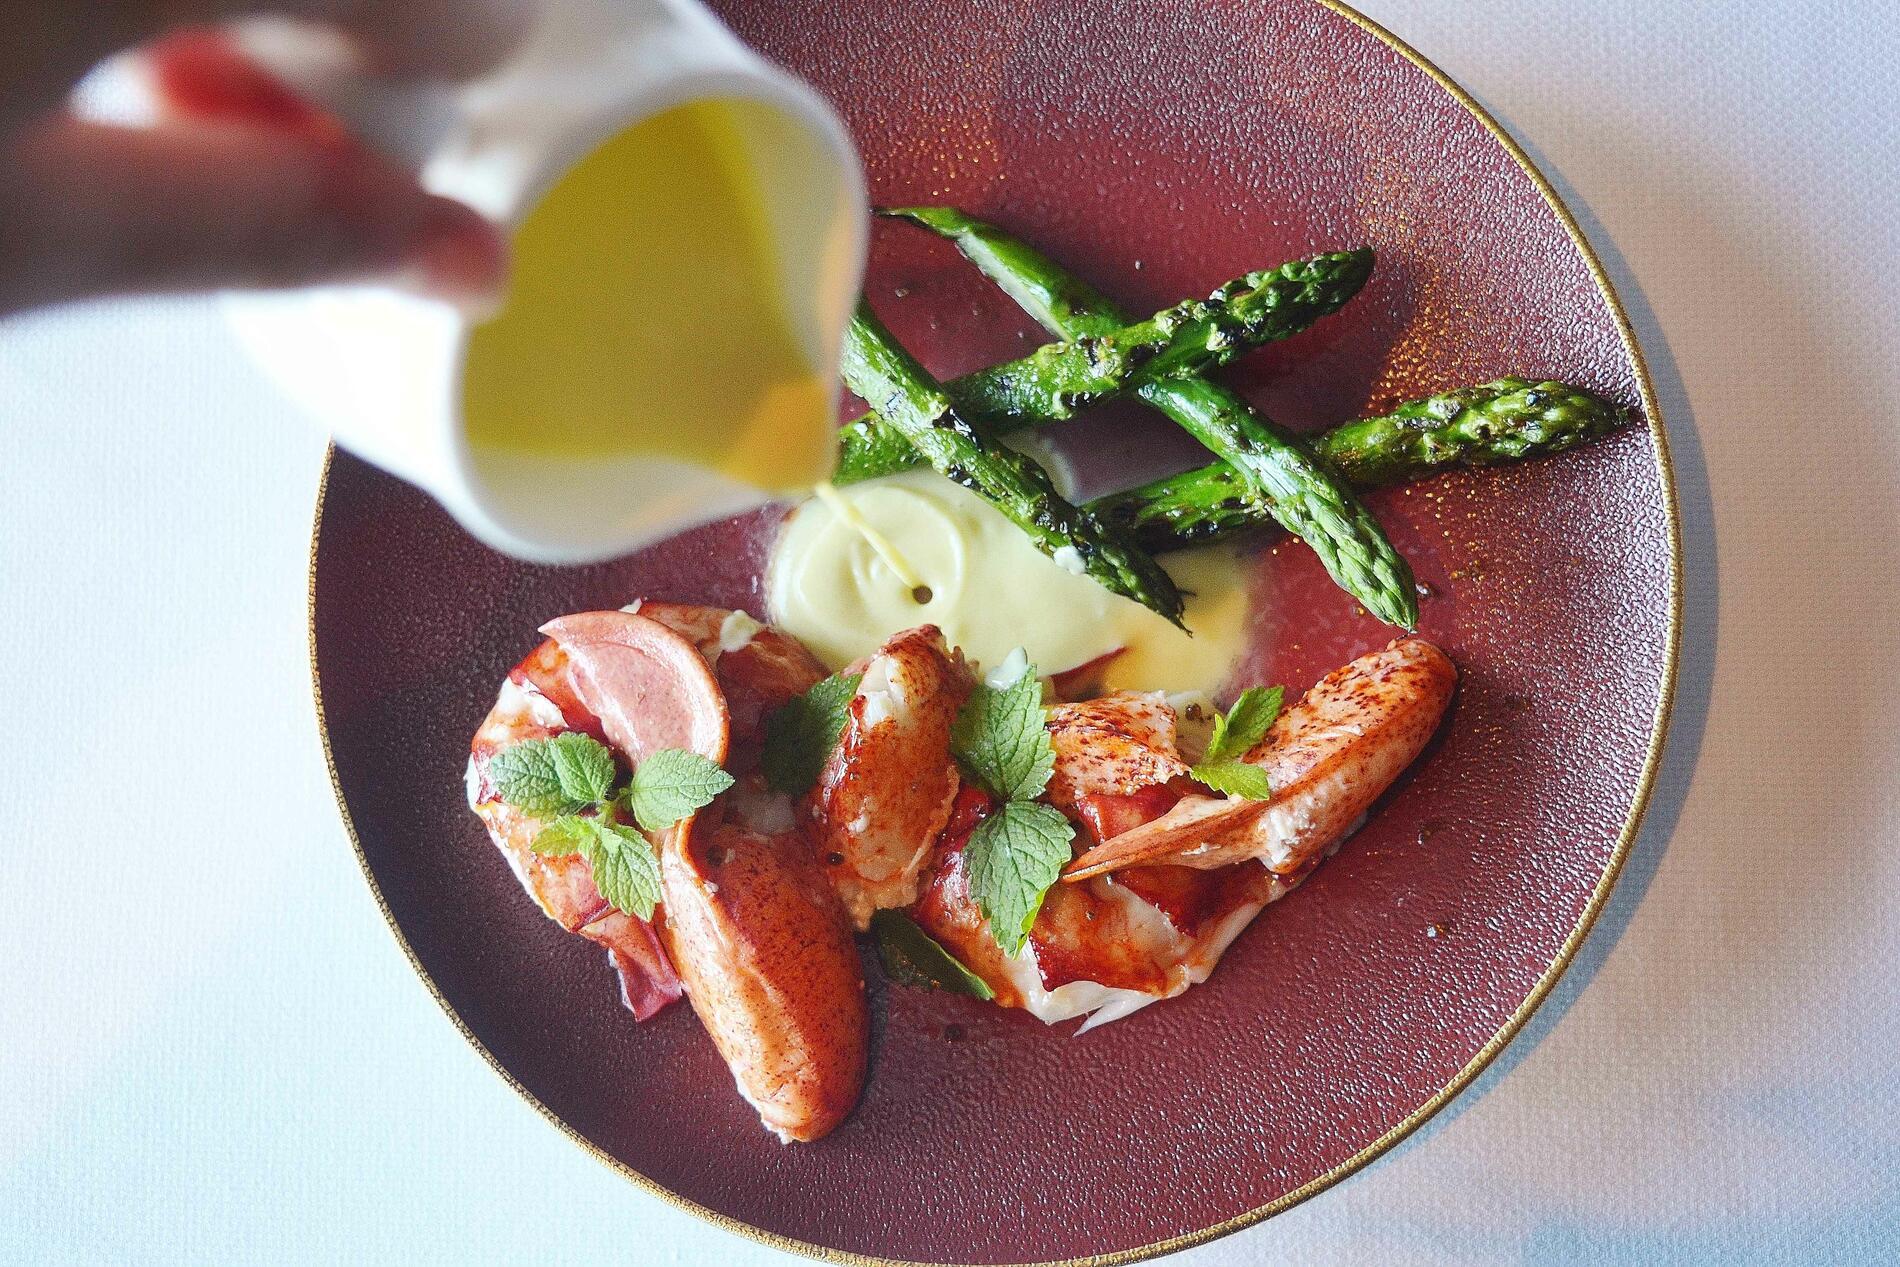 Lobster asparagus dish